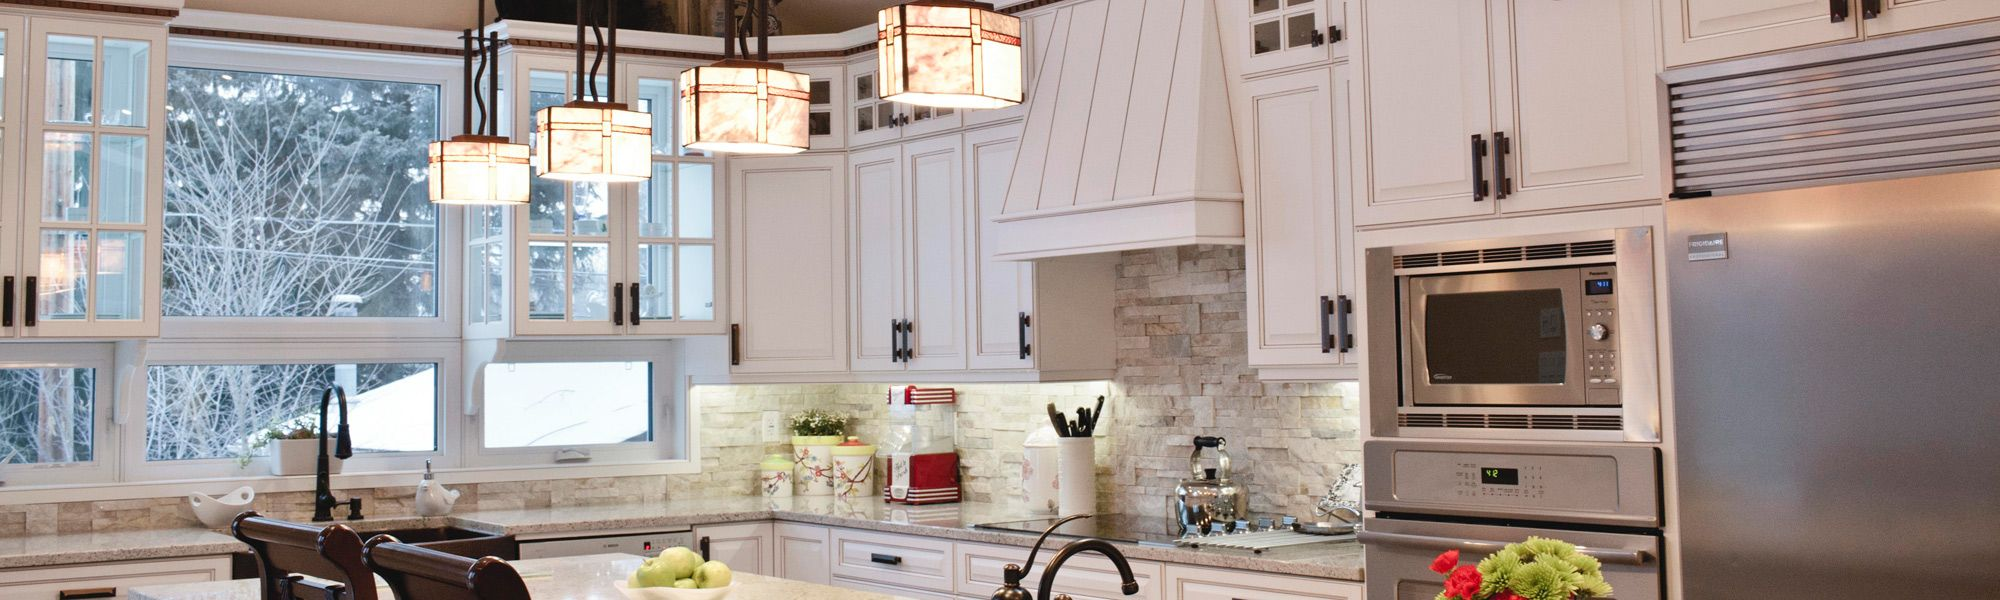 Uncategorized Kitchen Cabinets Abbotsford columbia cabinets